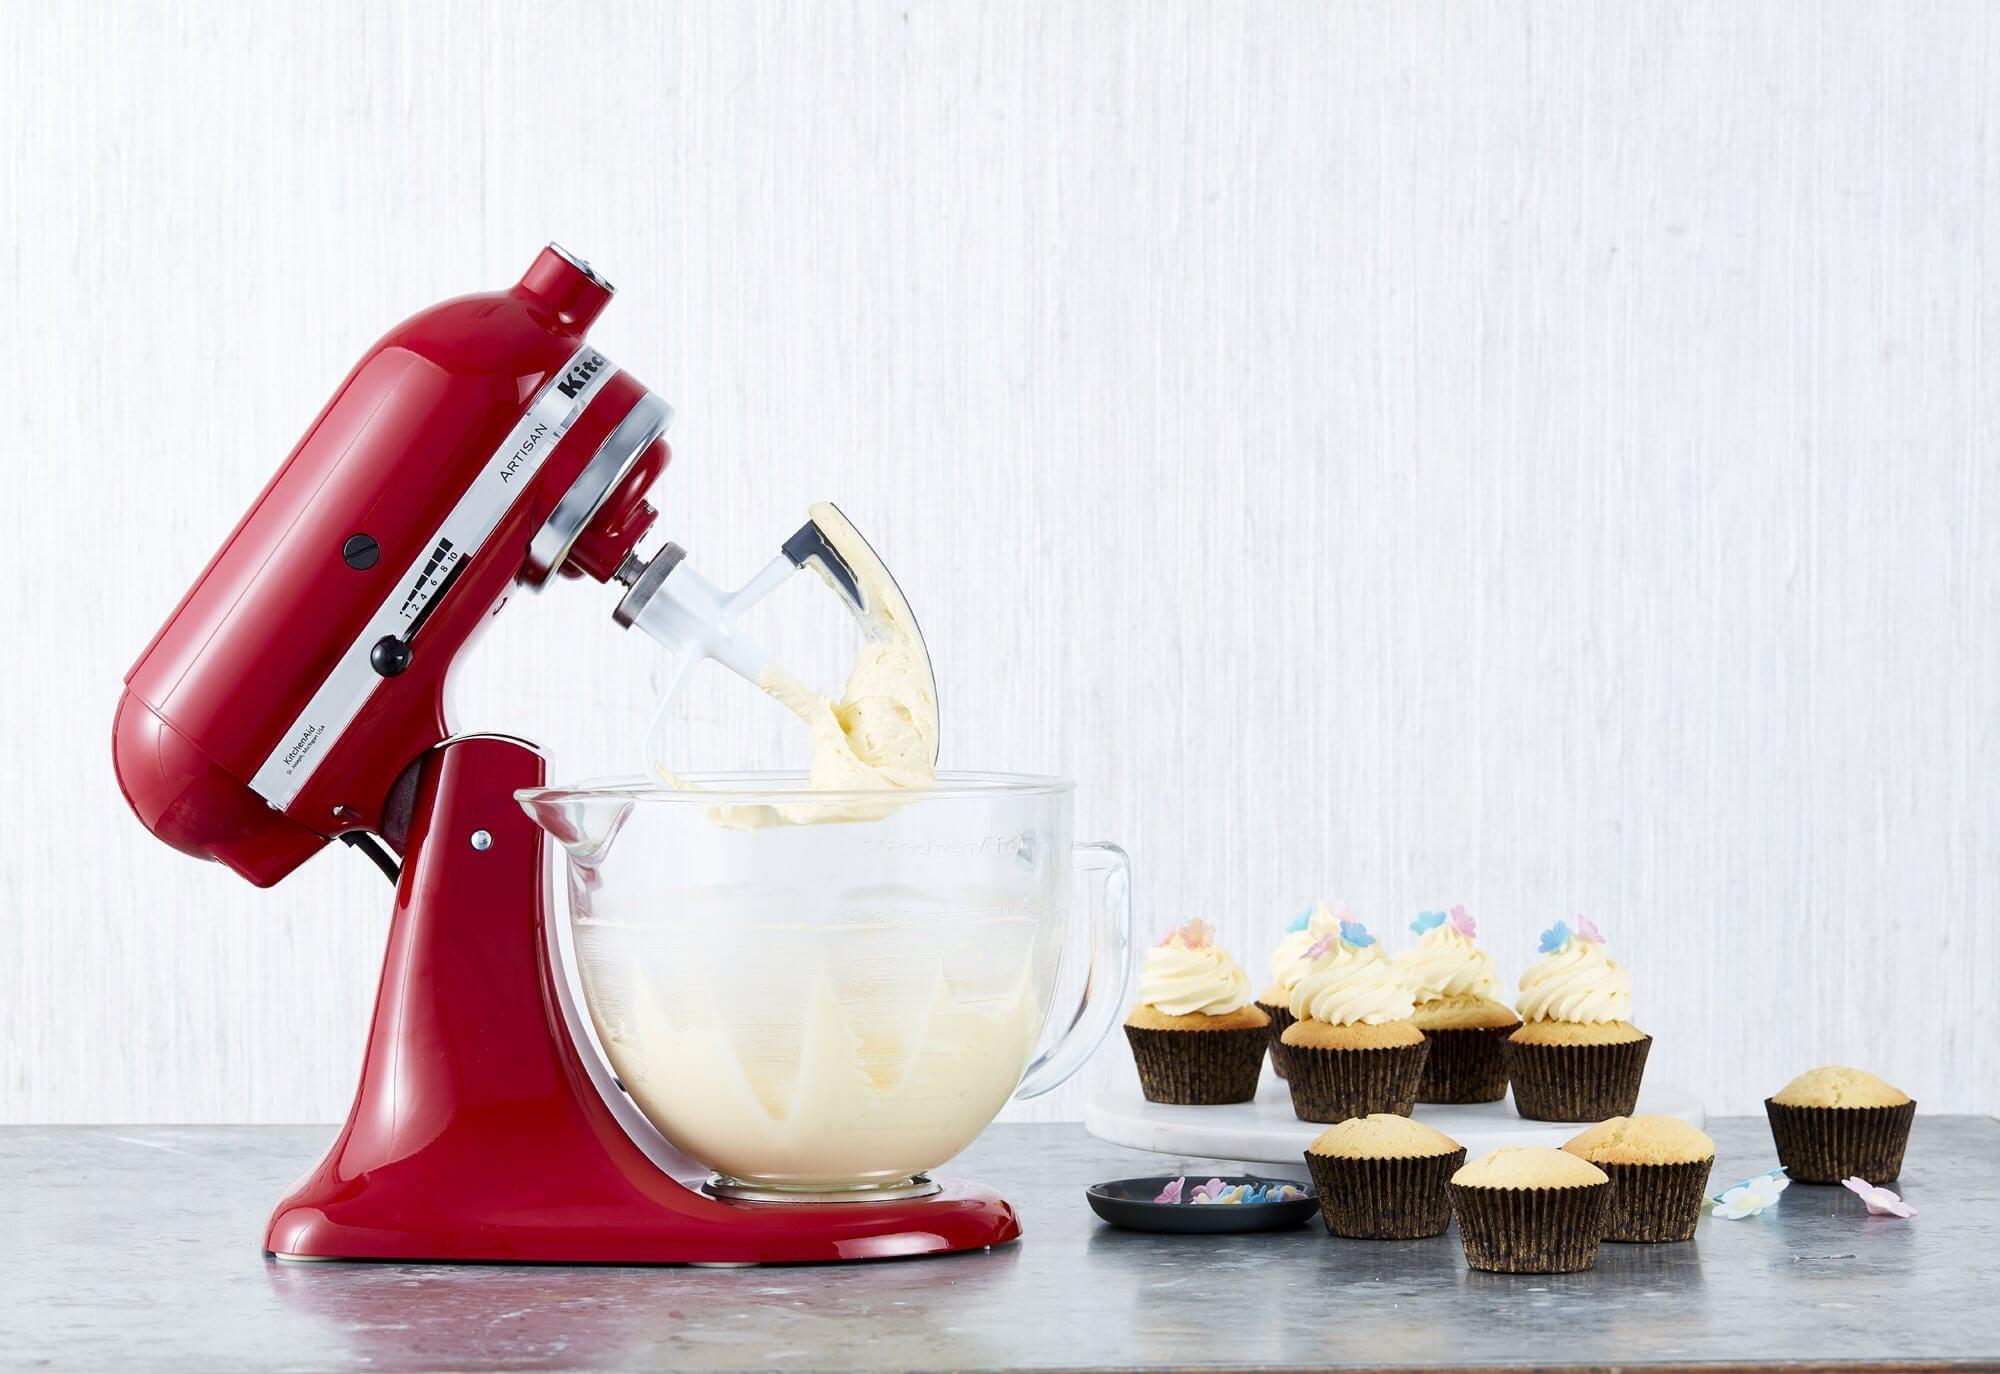 Kitchenaid comparatif kitchen aid classic ou artisan classic vs artisan quel robot choisir